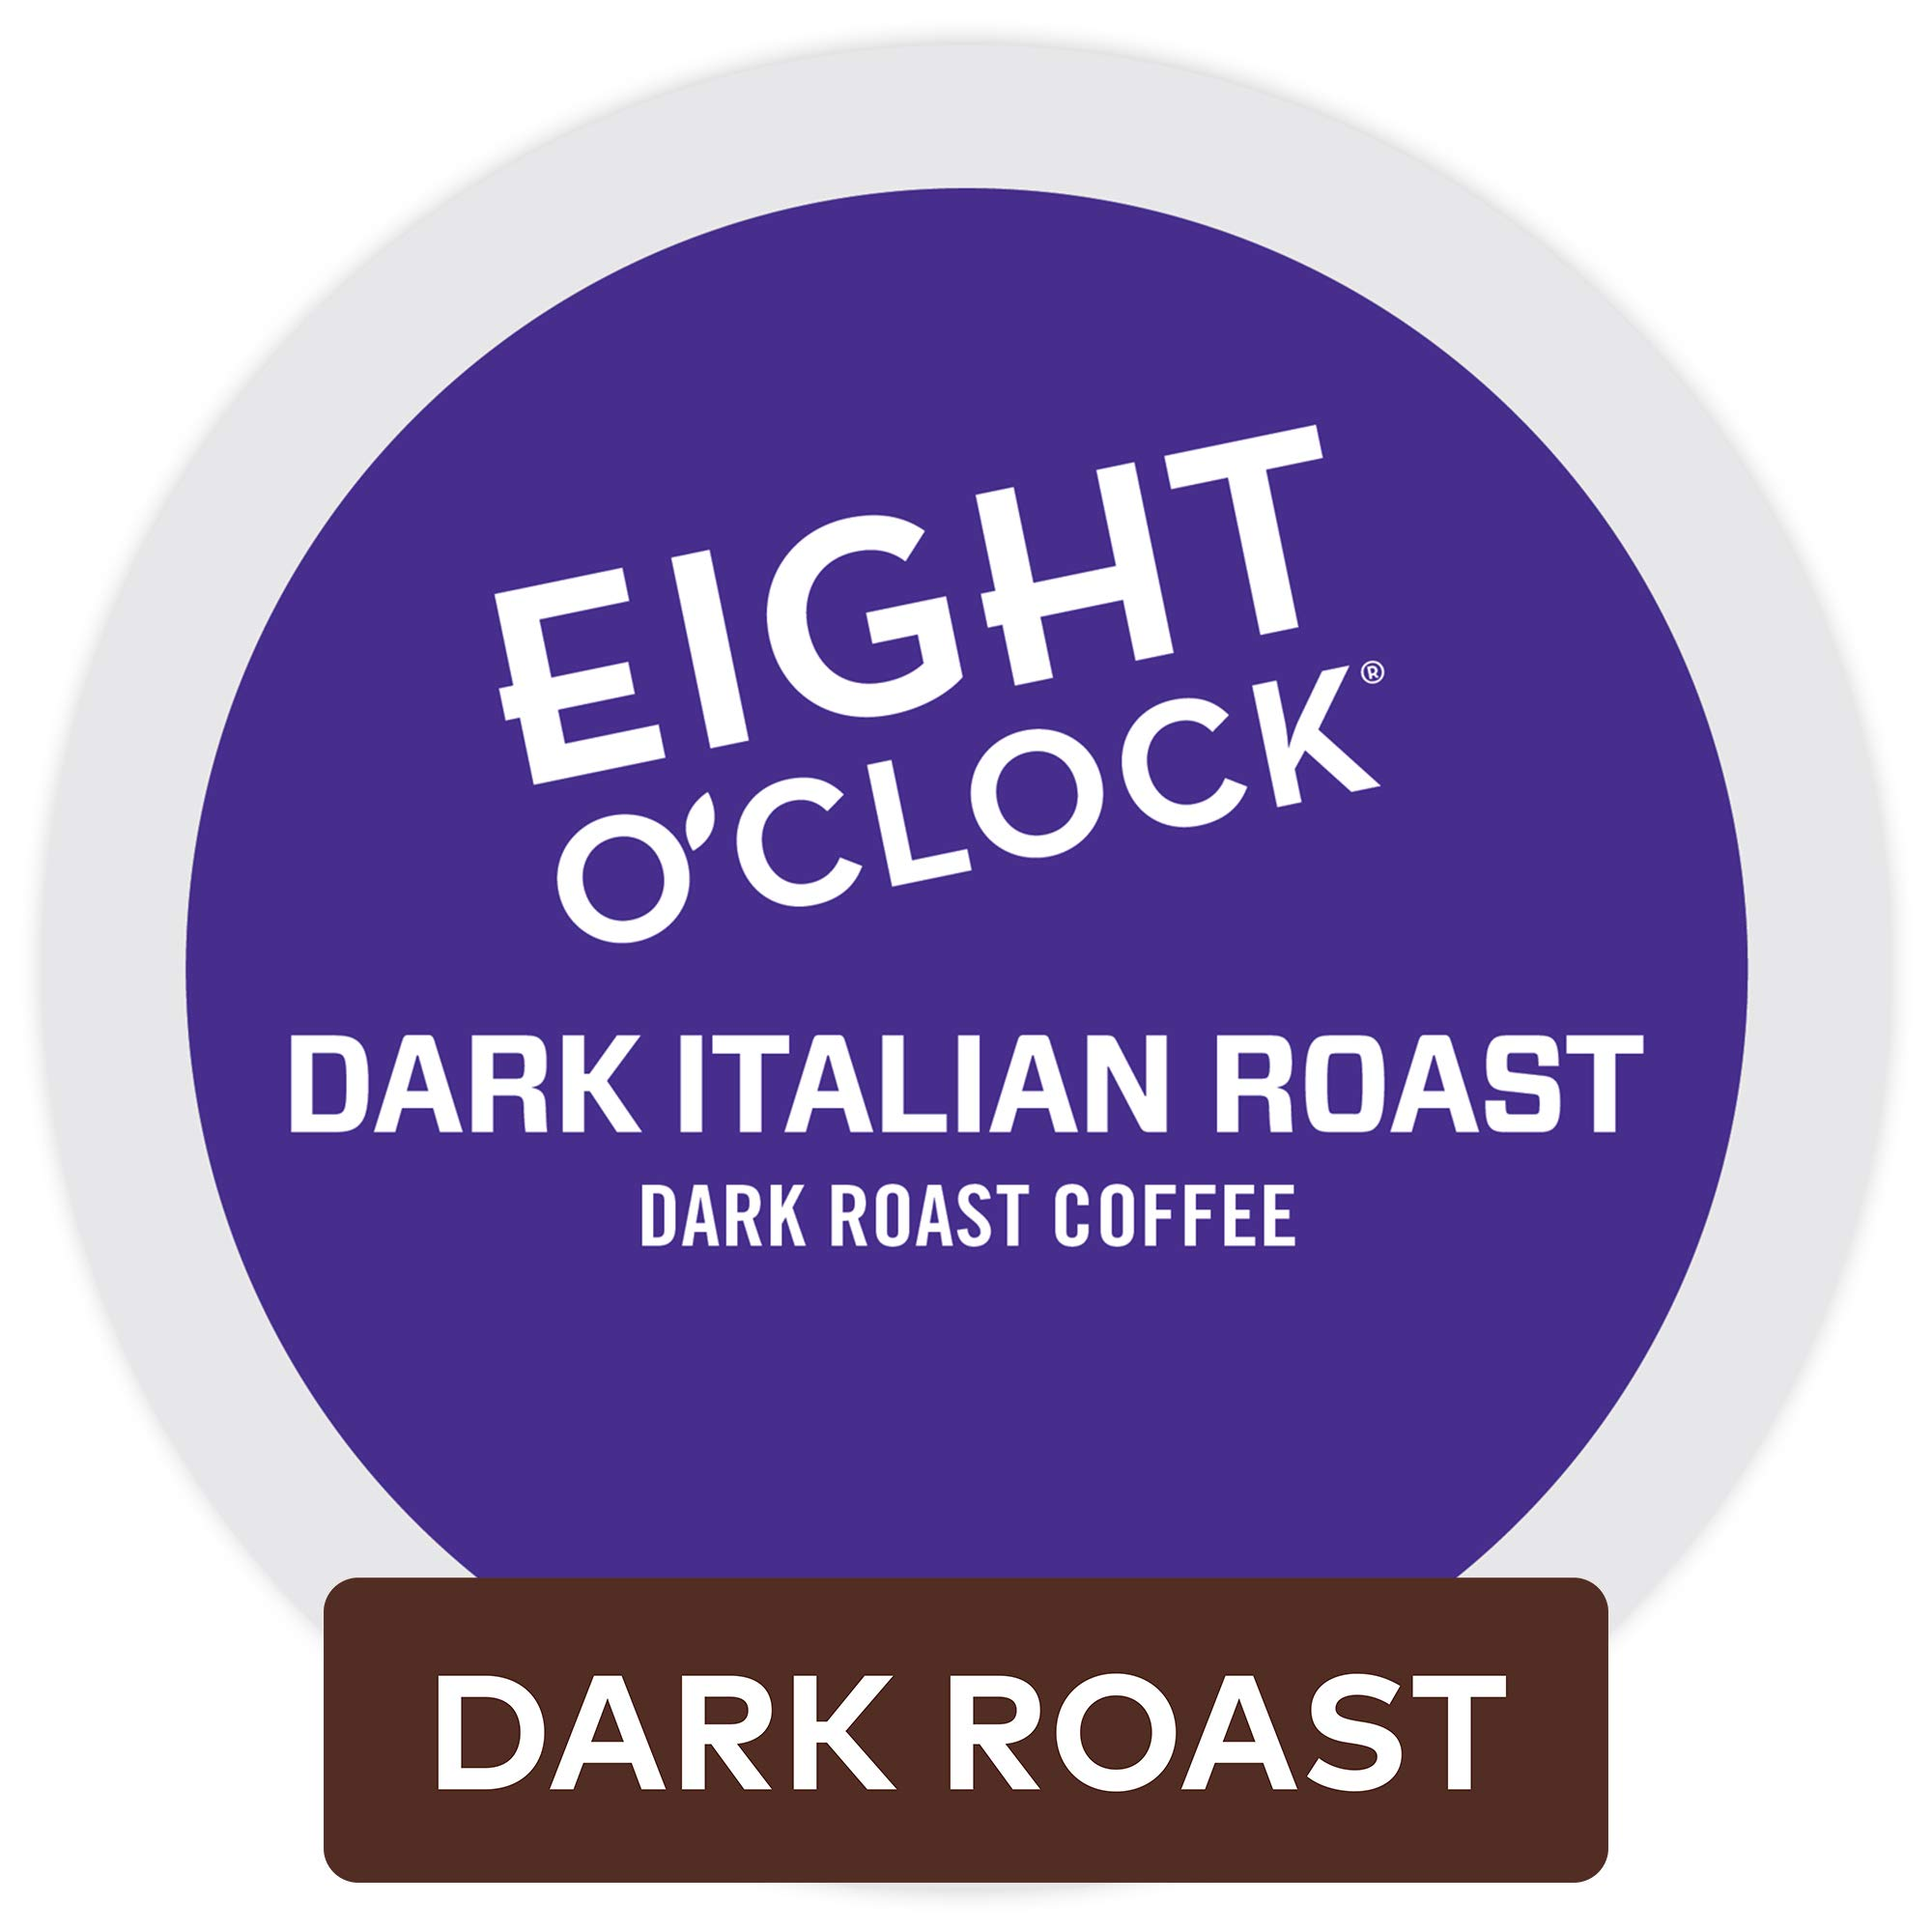 Eight O'Clock Coffee Dark Italian Roast, Single Serve Coffee K-Cup Pod, Dark Roast, 72